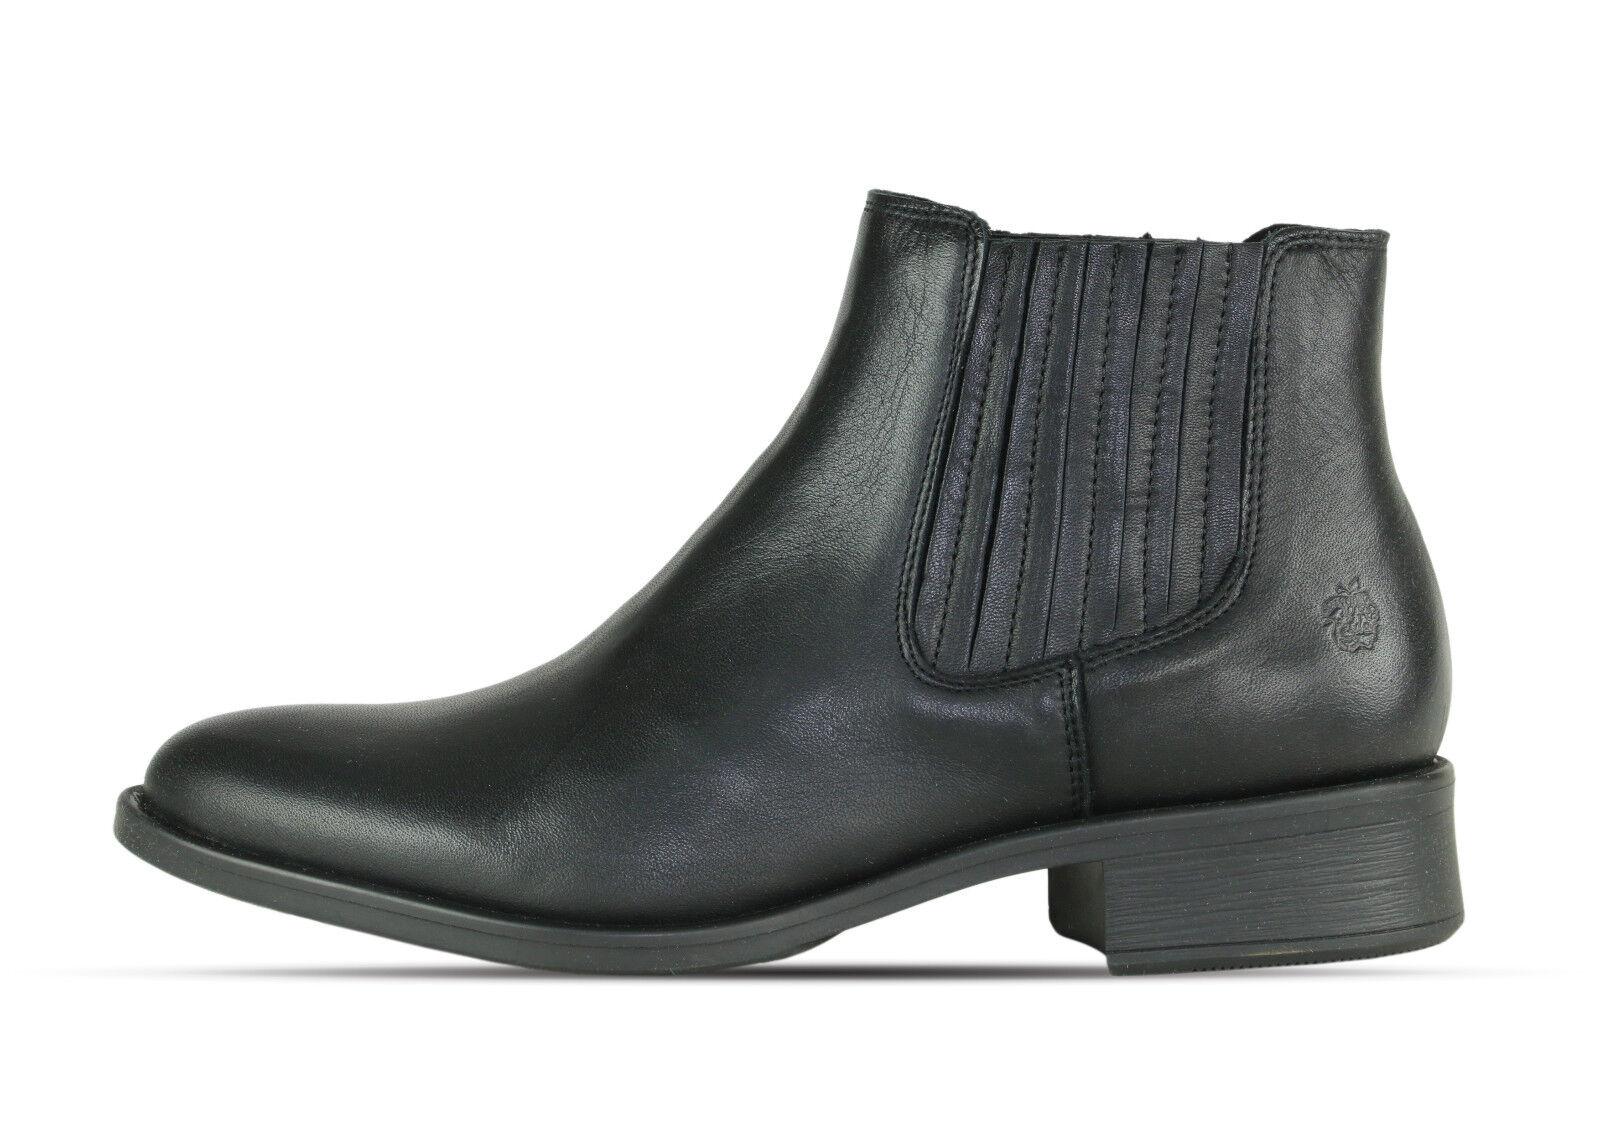 Grandes zapatos con descuento Apple OF EDEN aw17-sting 1 NEGRO - Cuero - Negro - Botines - WOMEN + NUEVO + .